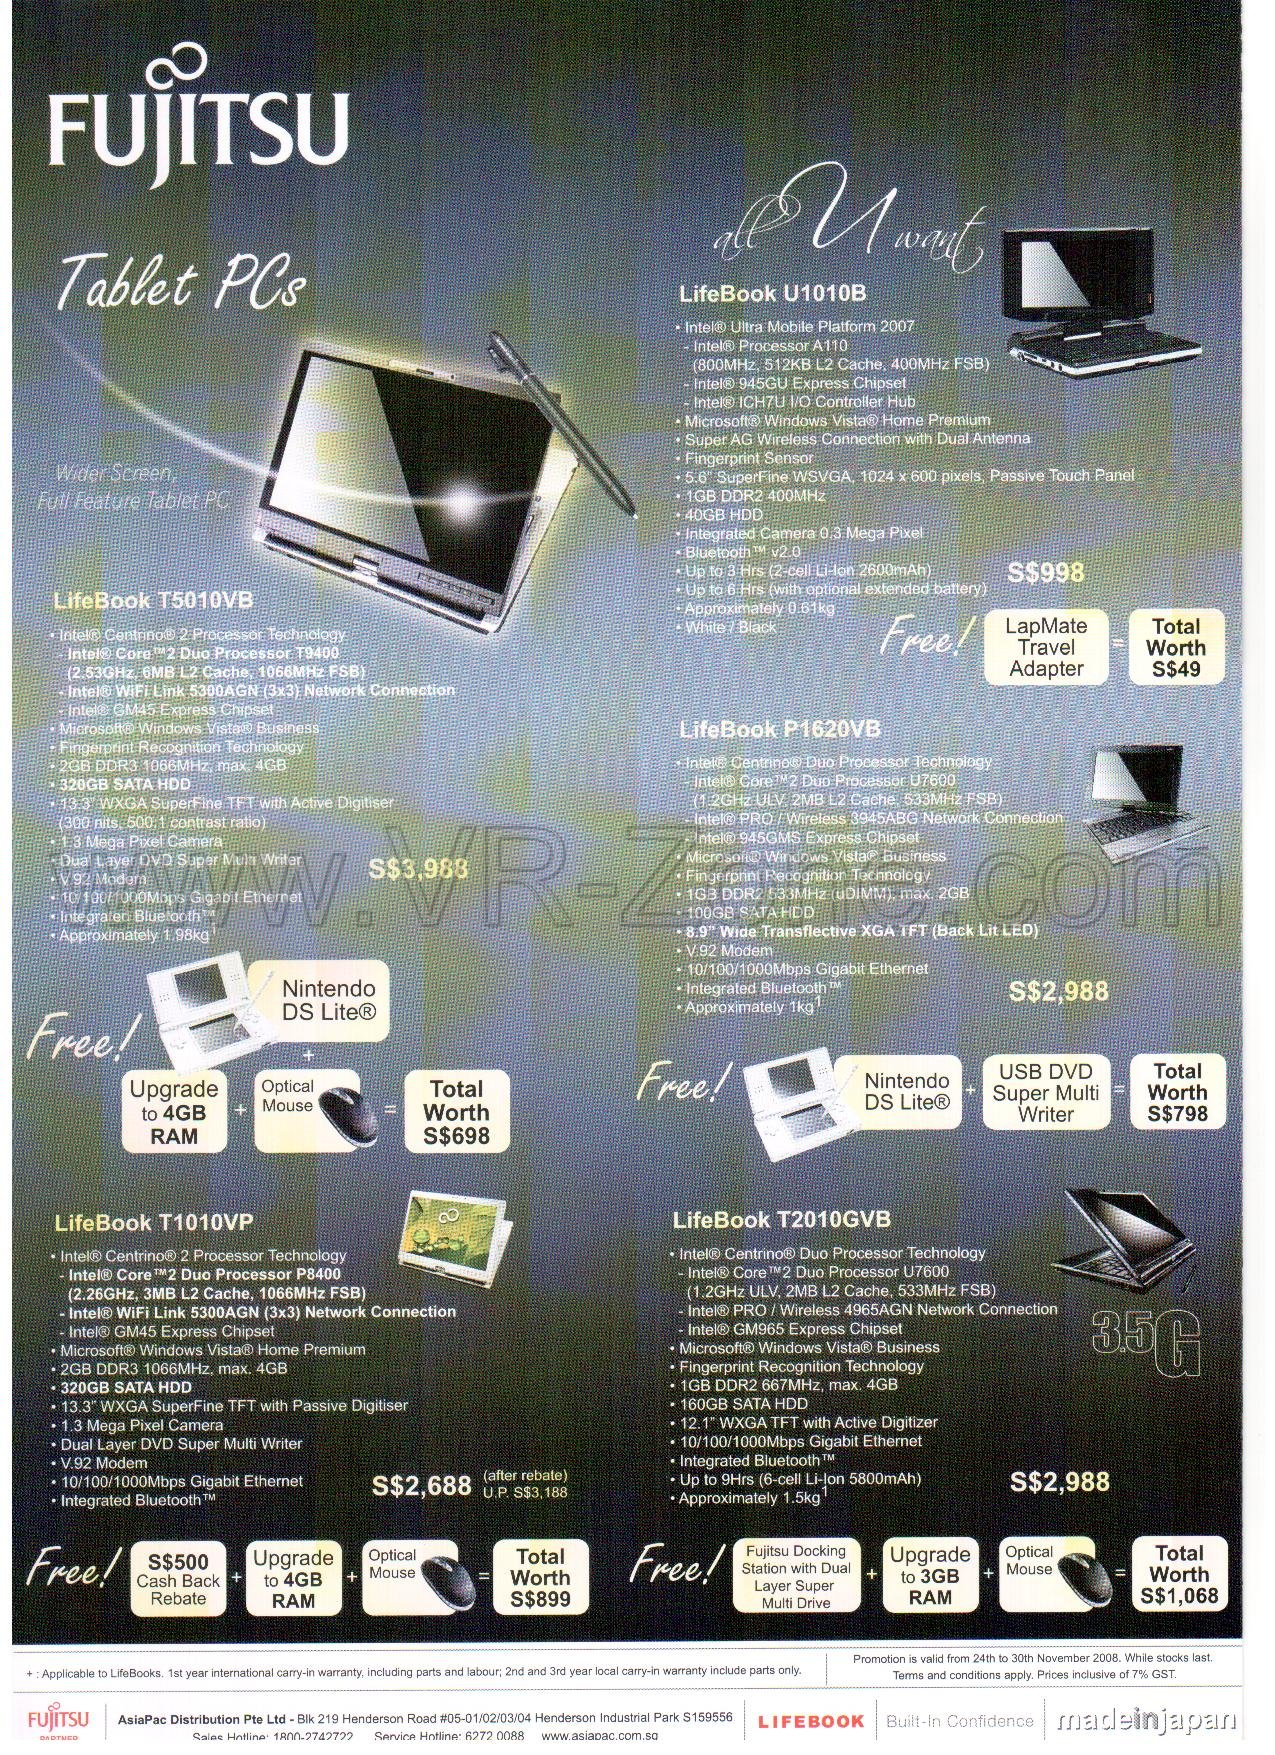 Sitex 2008 price list image brochure of Fujitsu Tablet Lifebook Notebooks 3